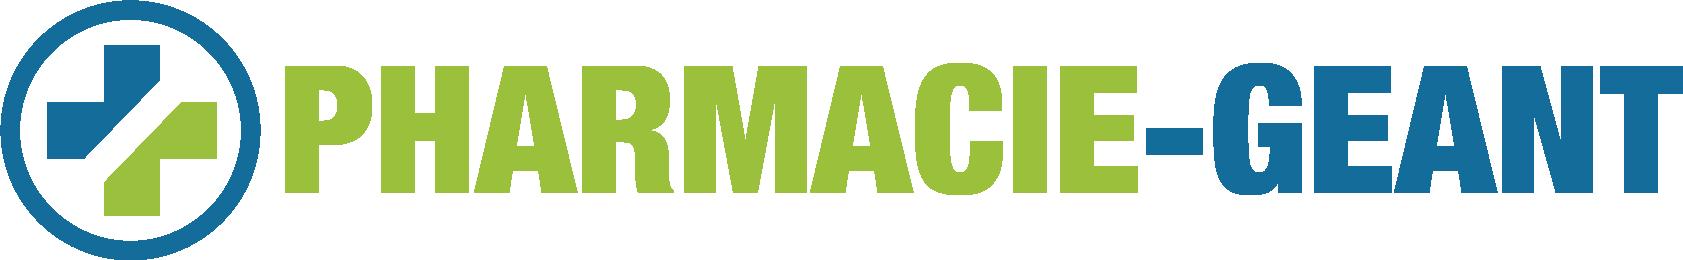 logo-pharmacie-geant